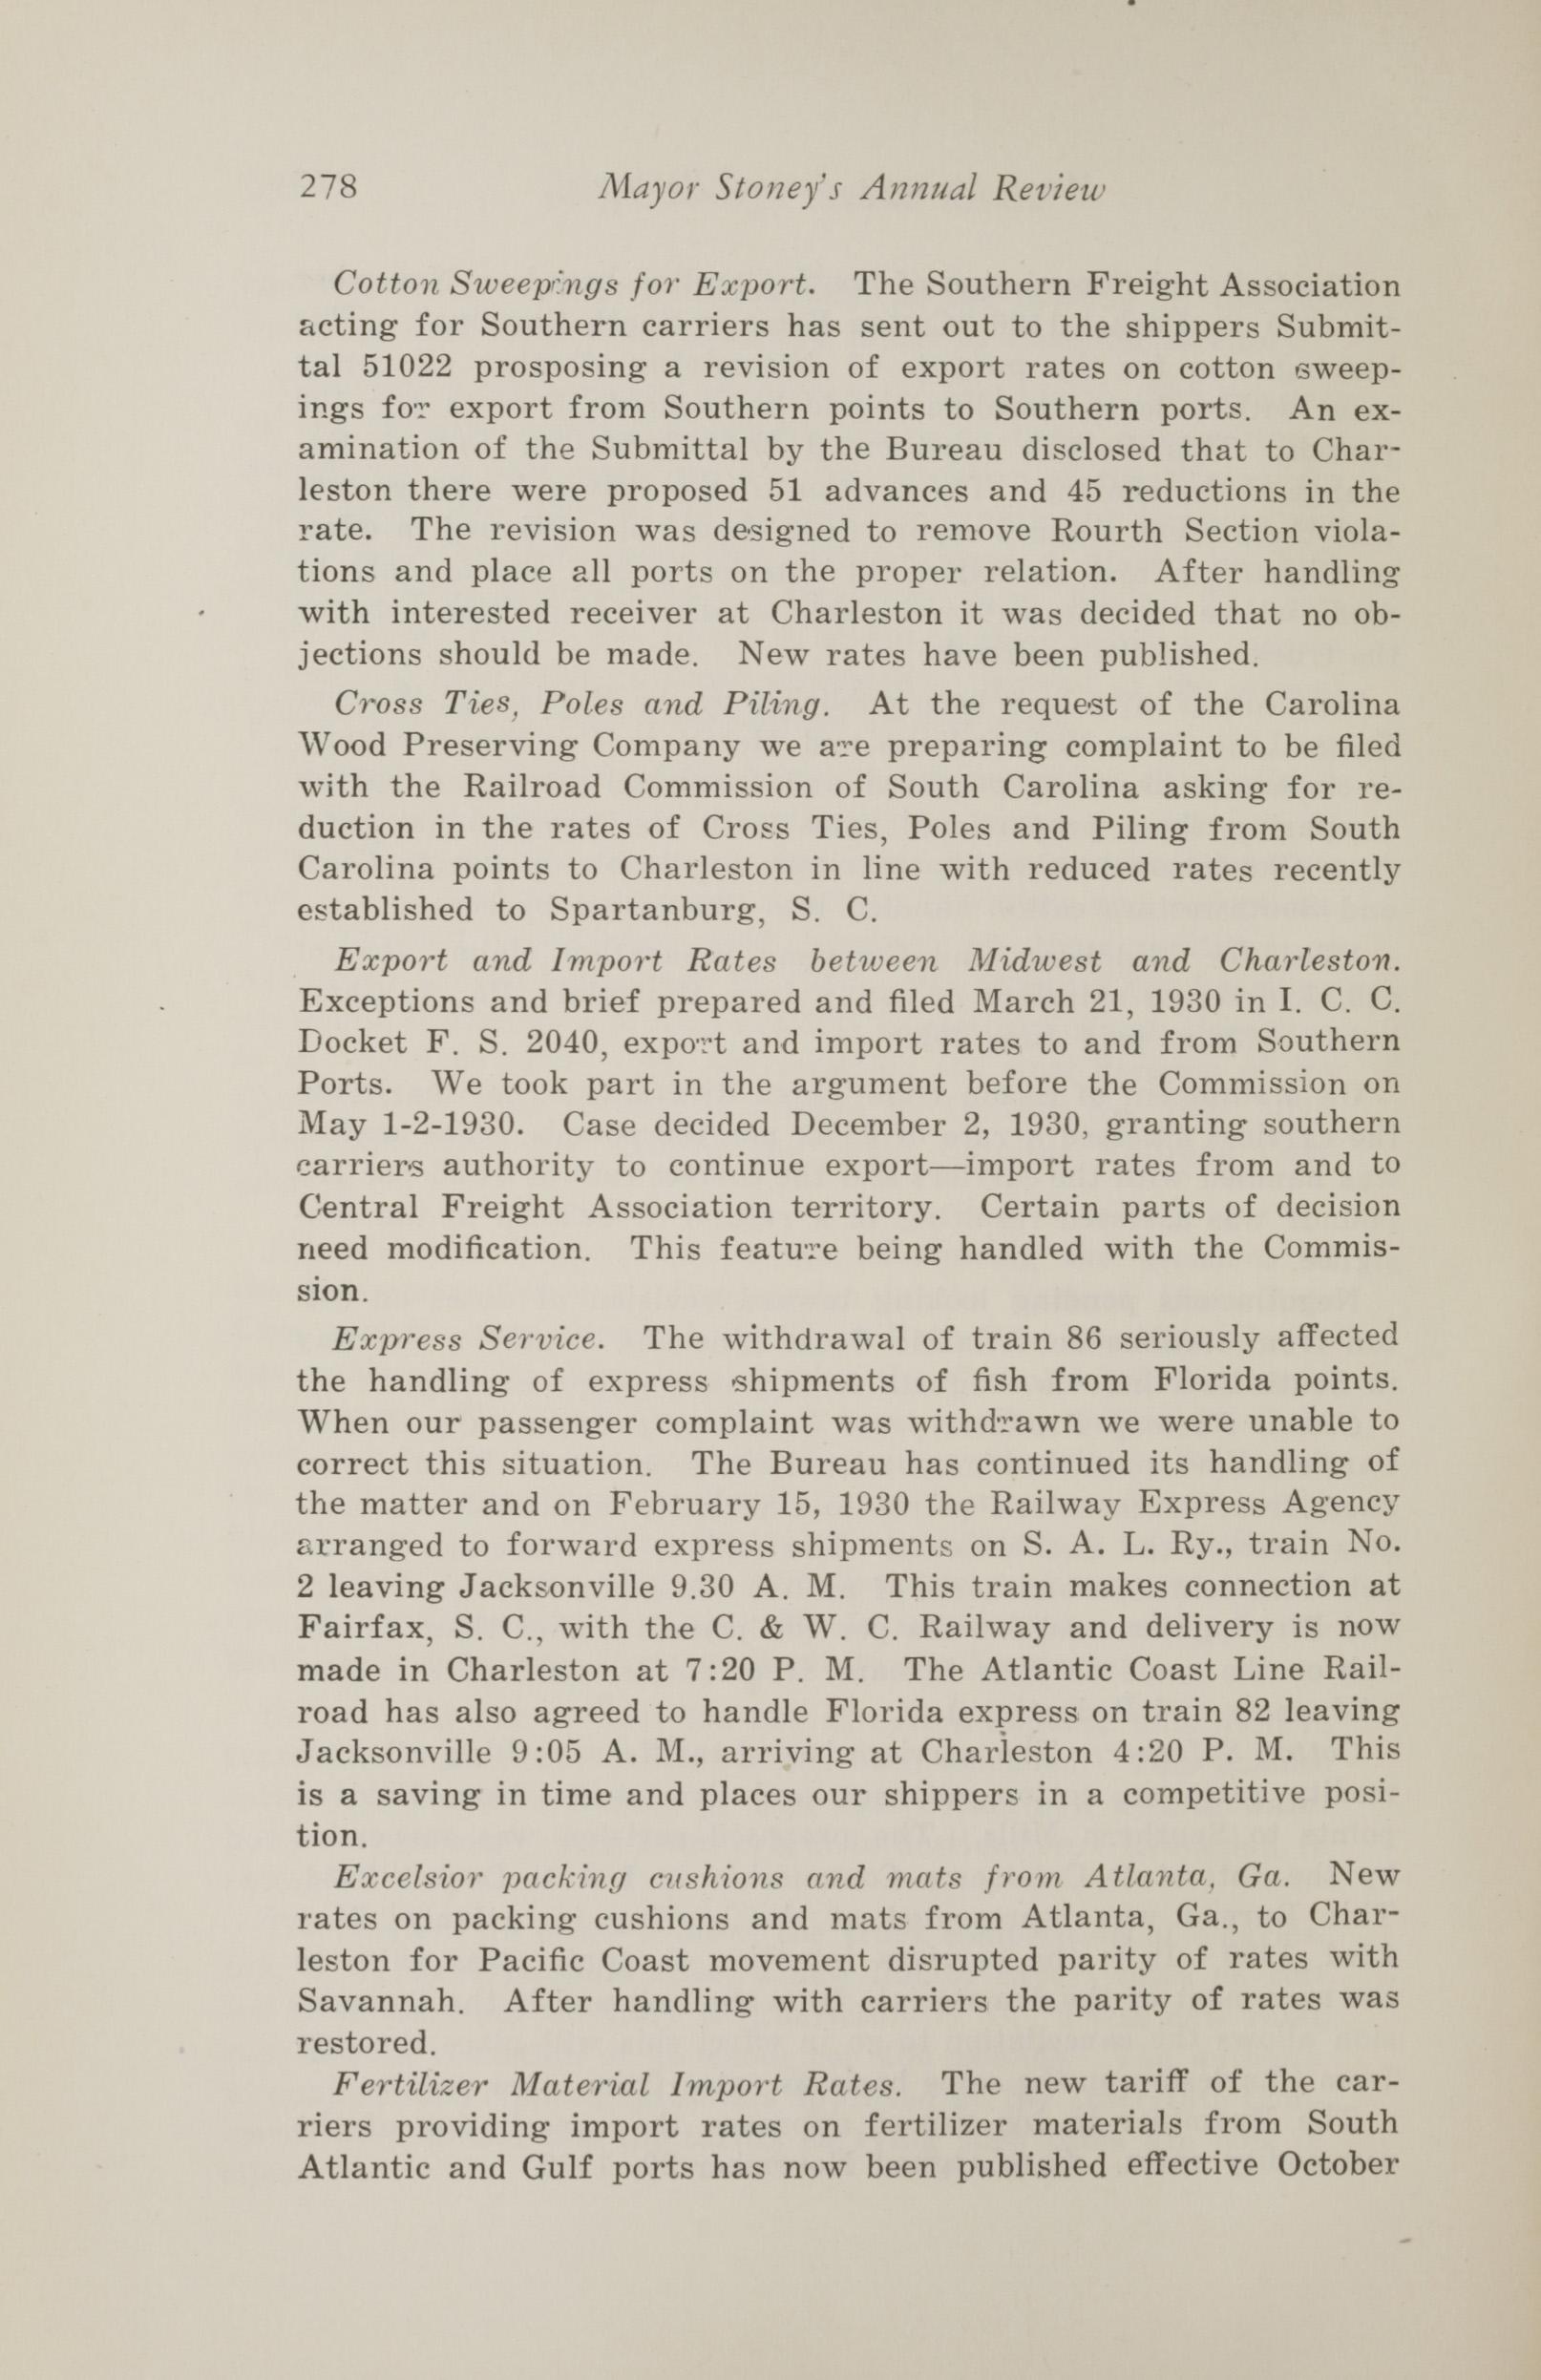 Charleston Yearbook, 1930, page 278